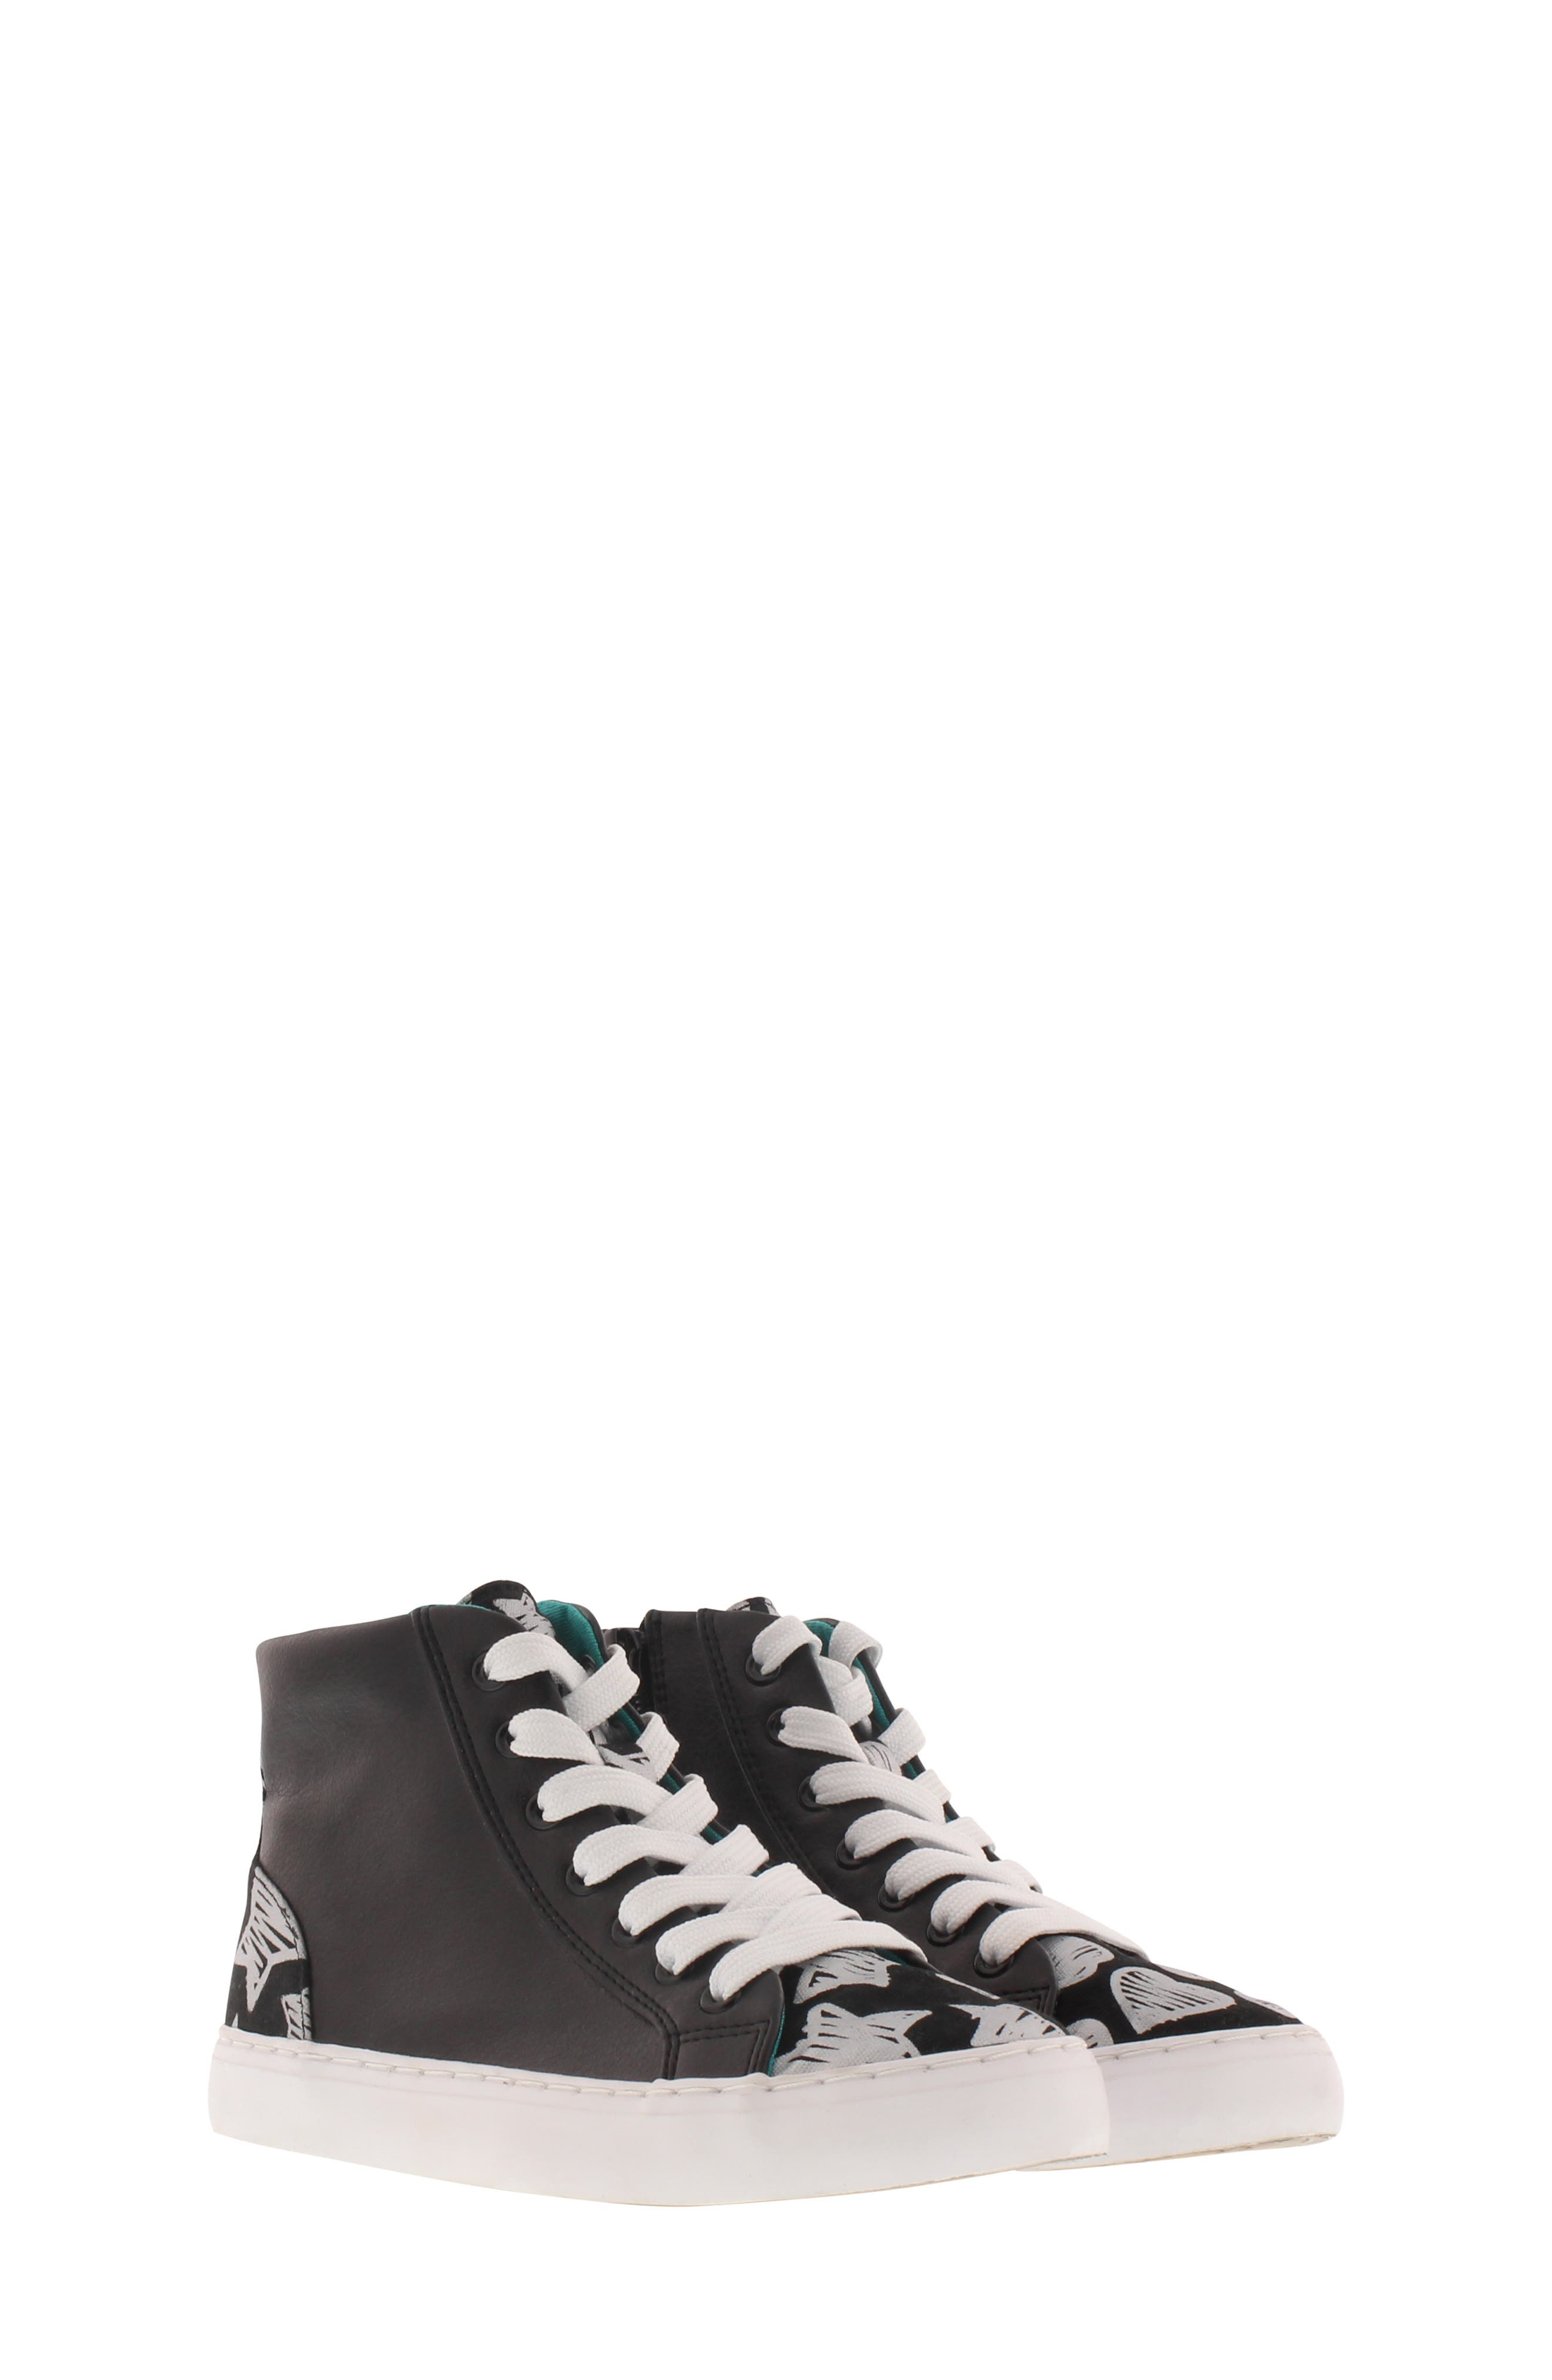 CHOOZE, Uplift Superstar High Top Sneaker, Main thumbnail 1, color, BLACK